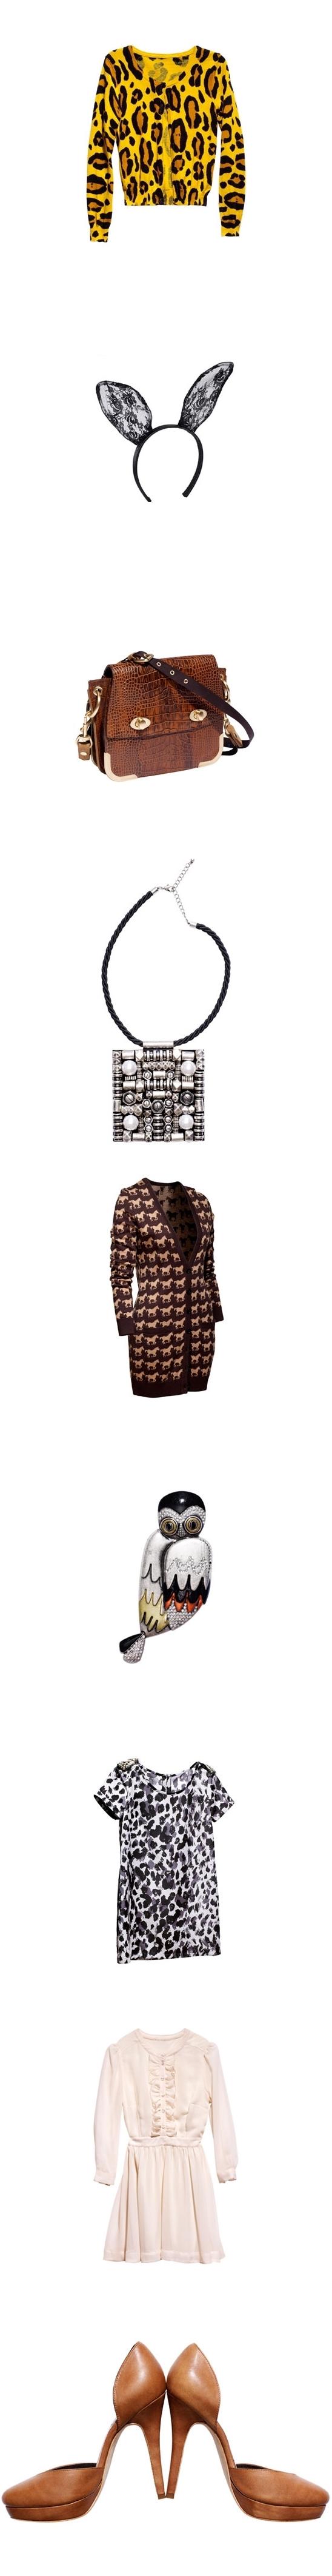 nyt hos H&M, leopard cardigan hm, heste print cardigan, horse print cardi H&M, blue shorts, blå shorts H&M